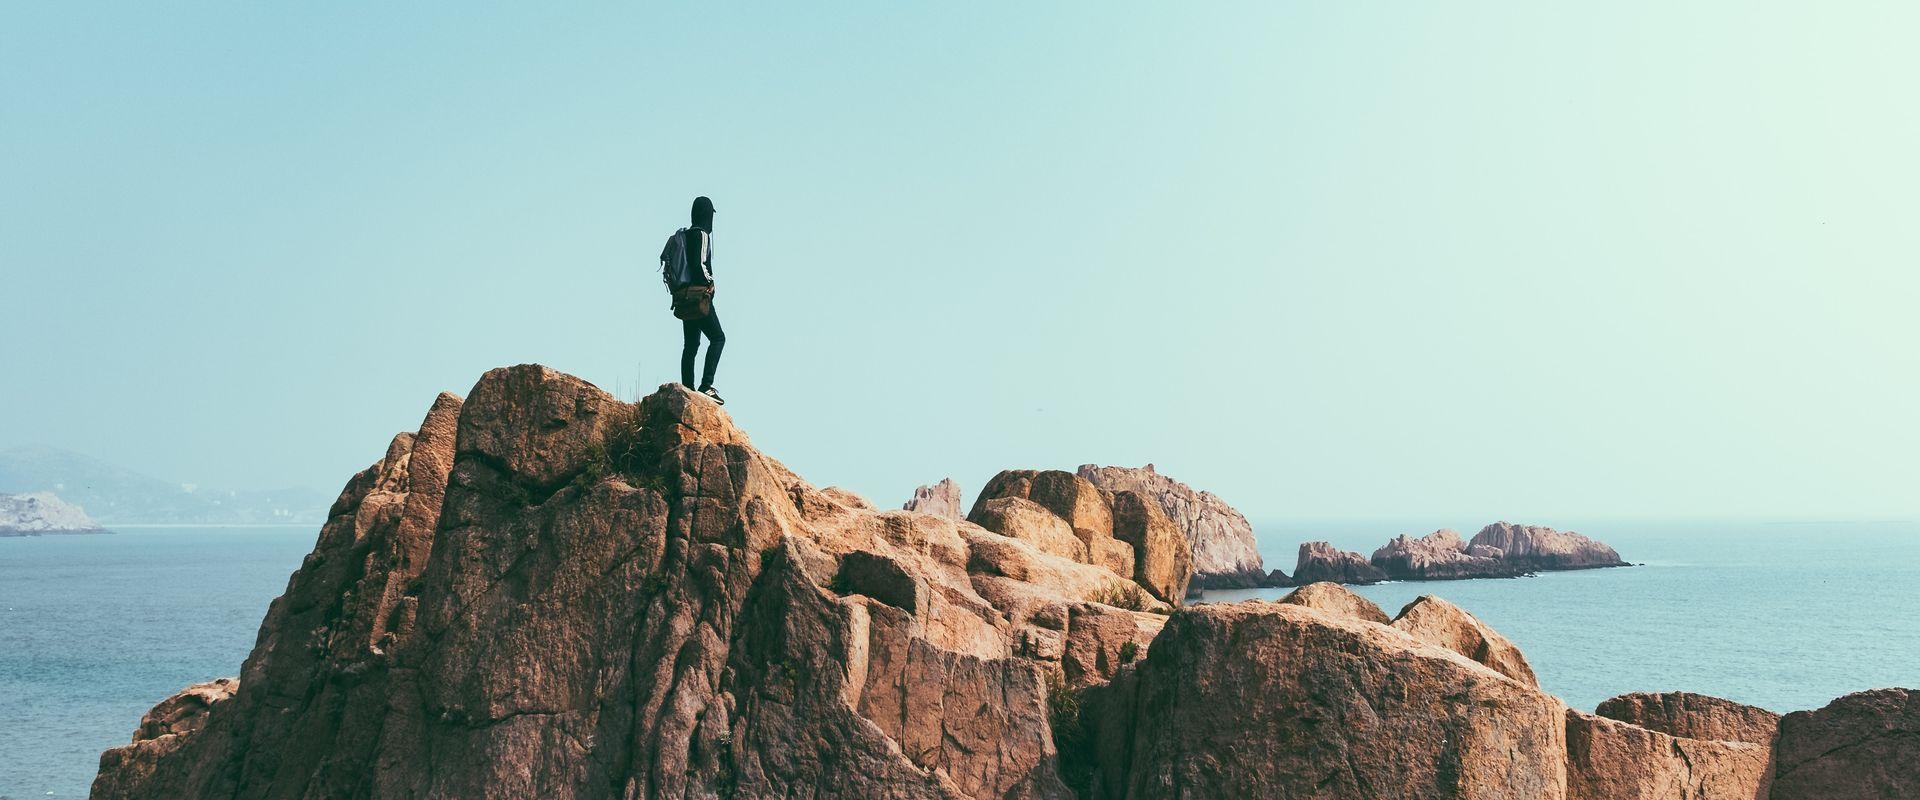 man on cliffside